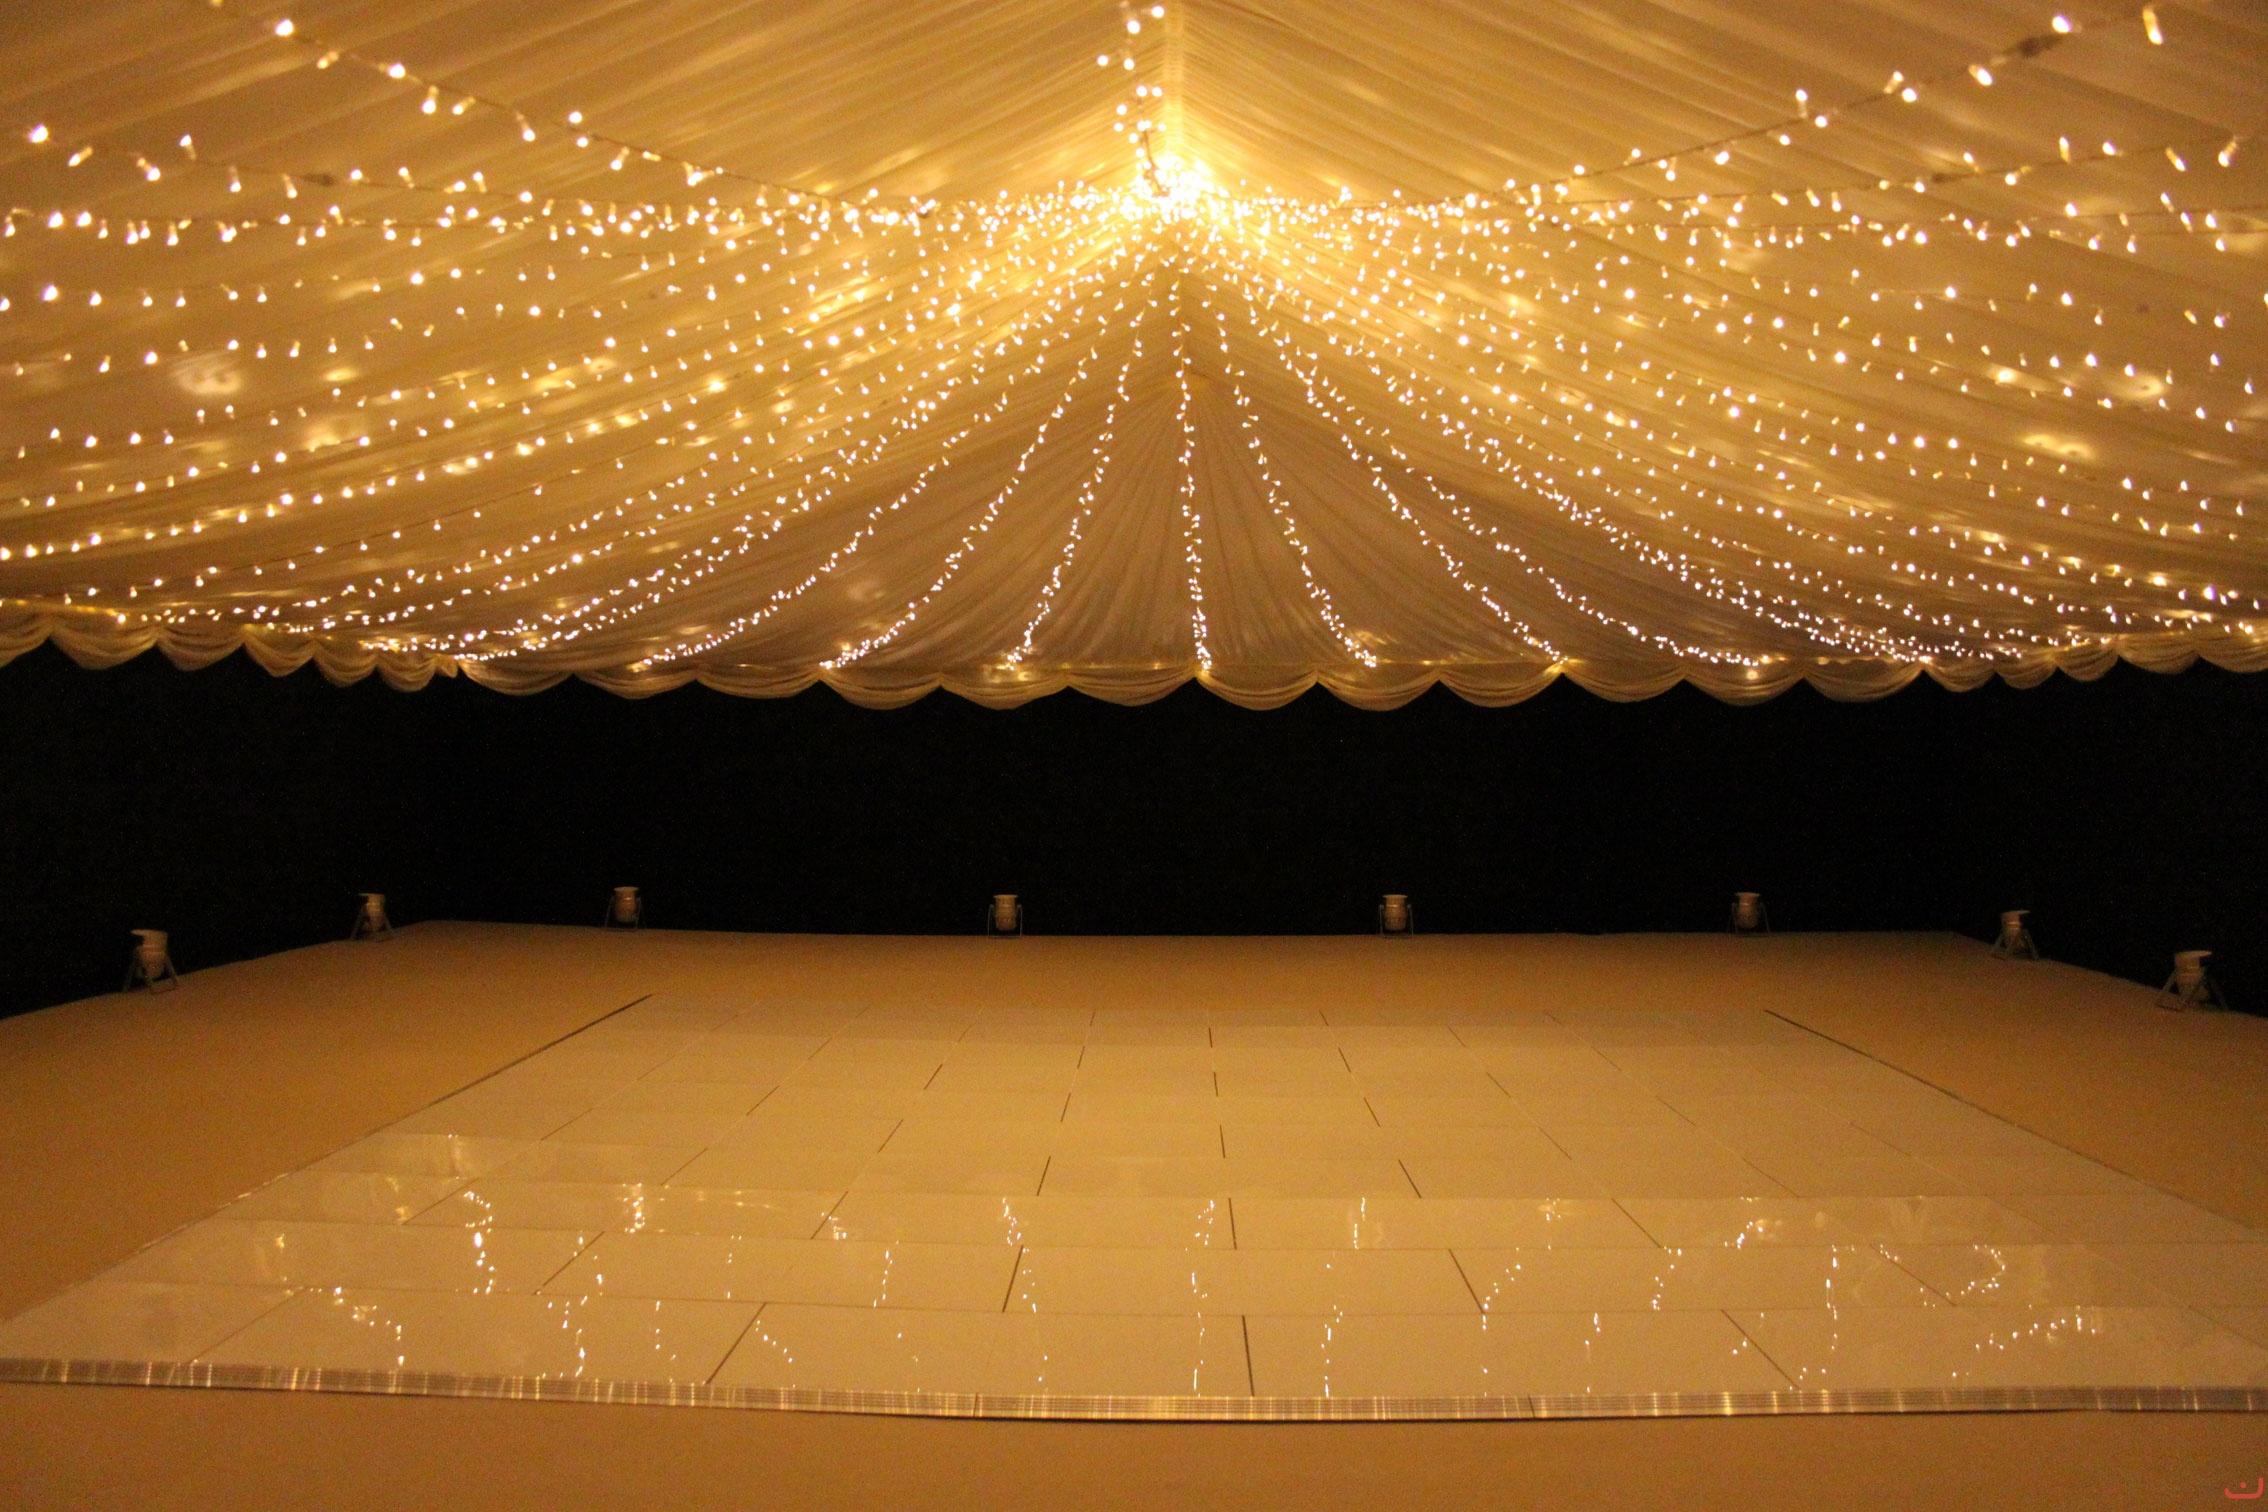 Fairy Light Ceiling: Djme- wedding dj - wedding music - sound lighting rental tuscany - Fairy  lights draping - Category: Fairy lights draping,Lighting